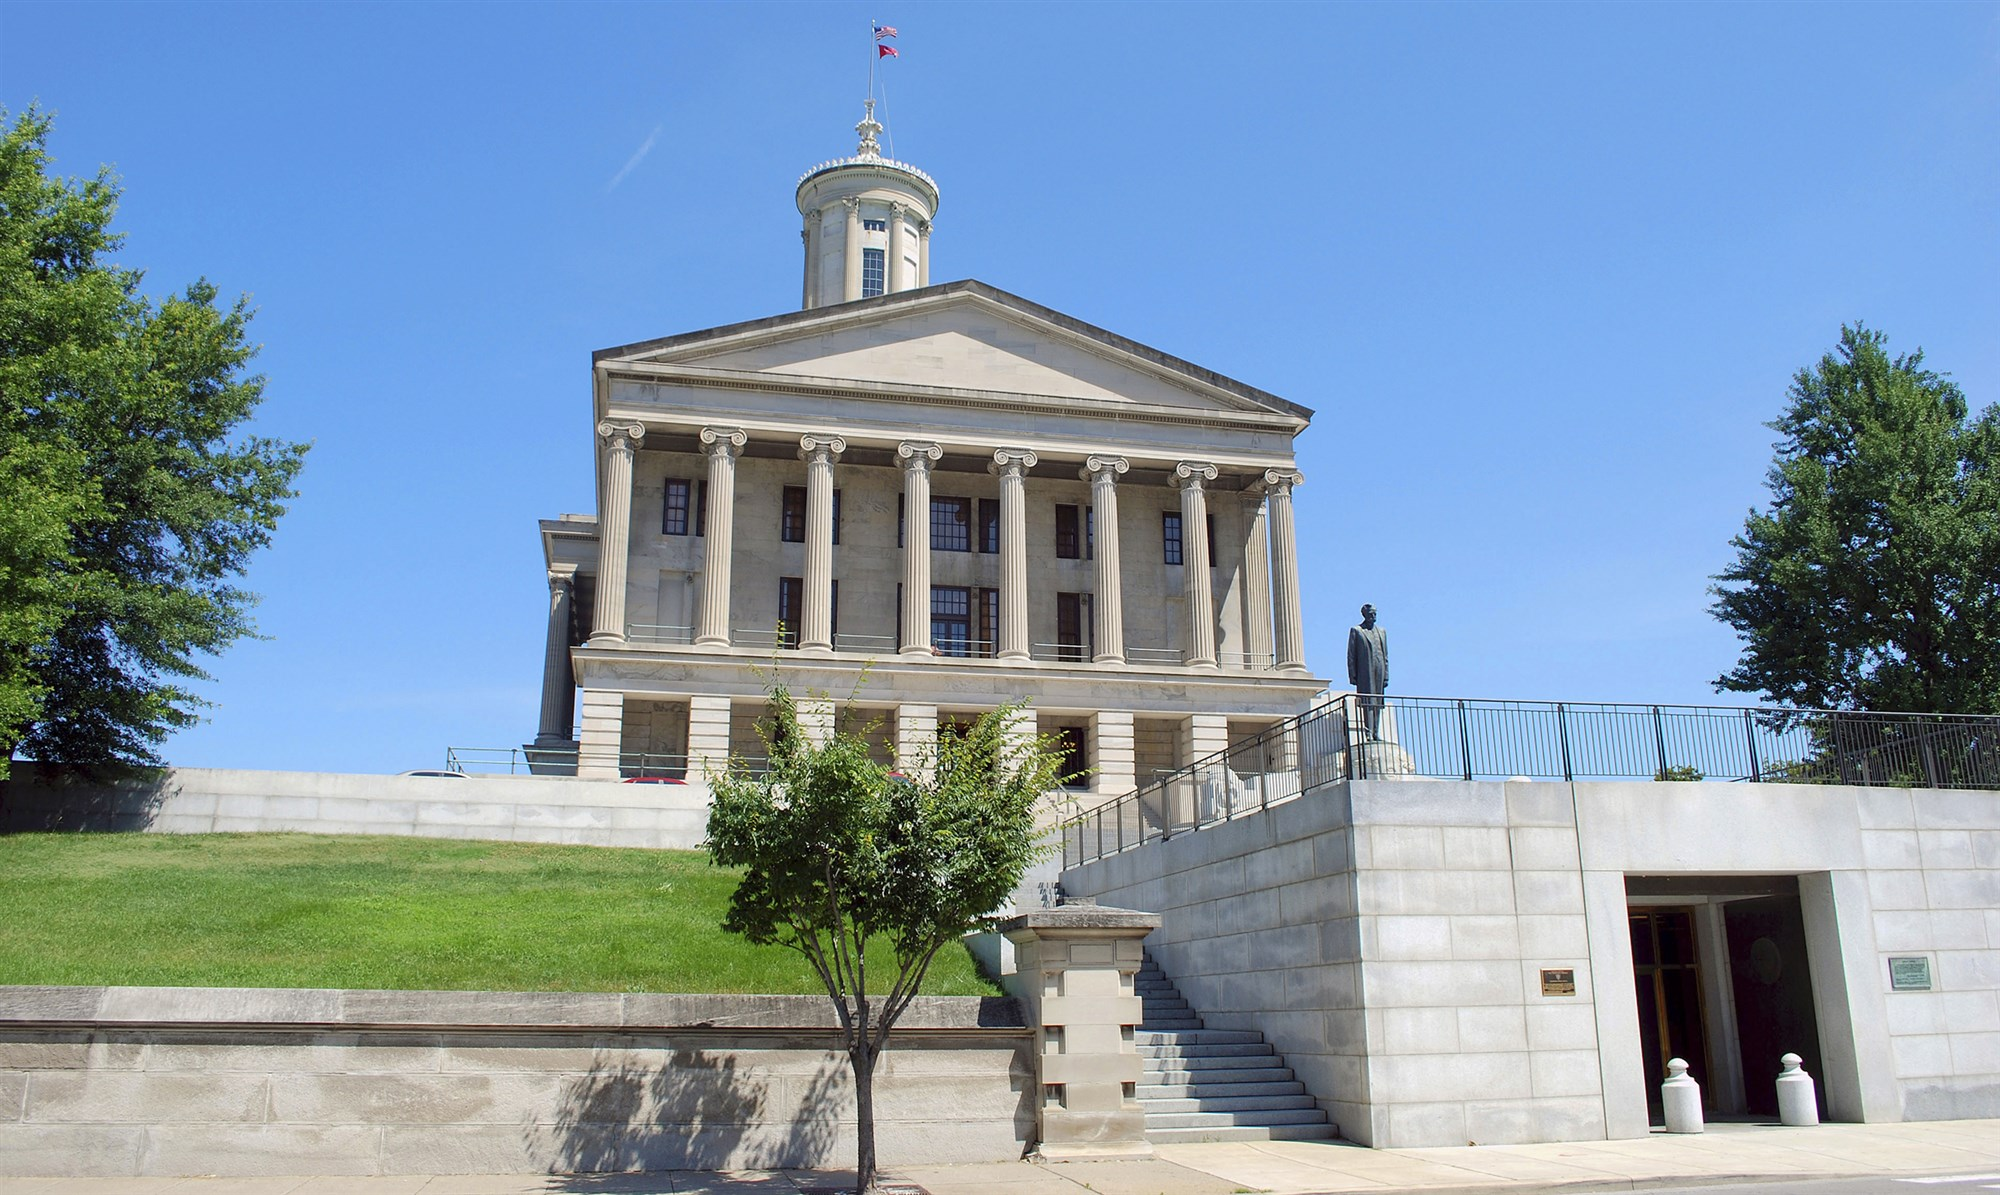 Tennessee state Capitol in Nashville_1557754456068.jpg.jpg